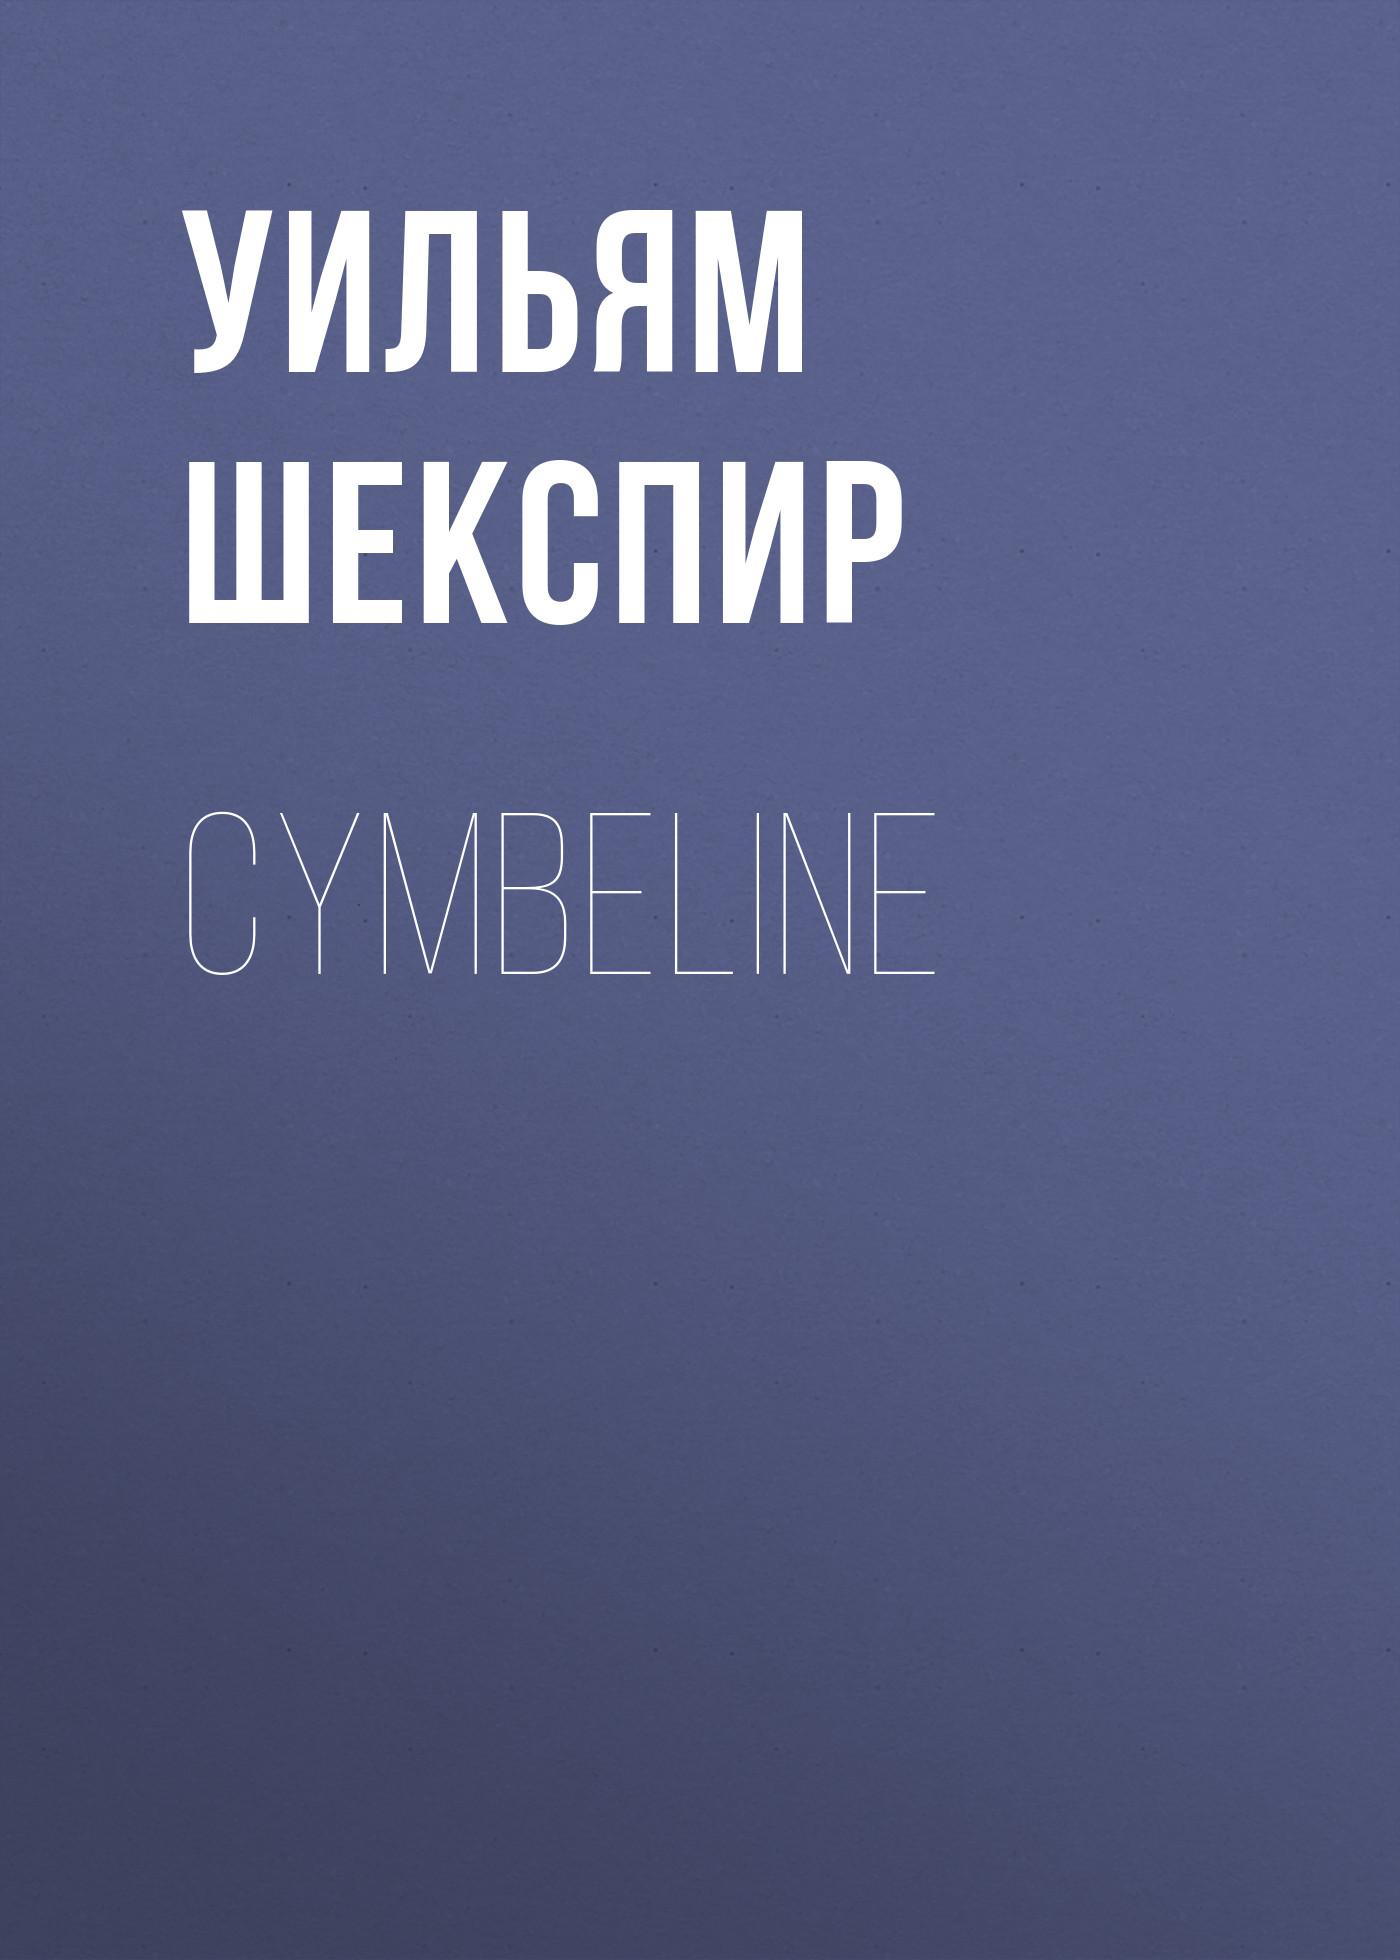 Уильям Шекспир Cymbeline цена и фото